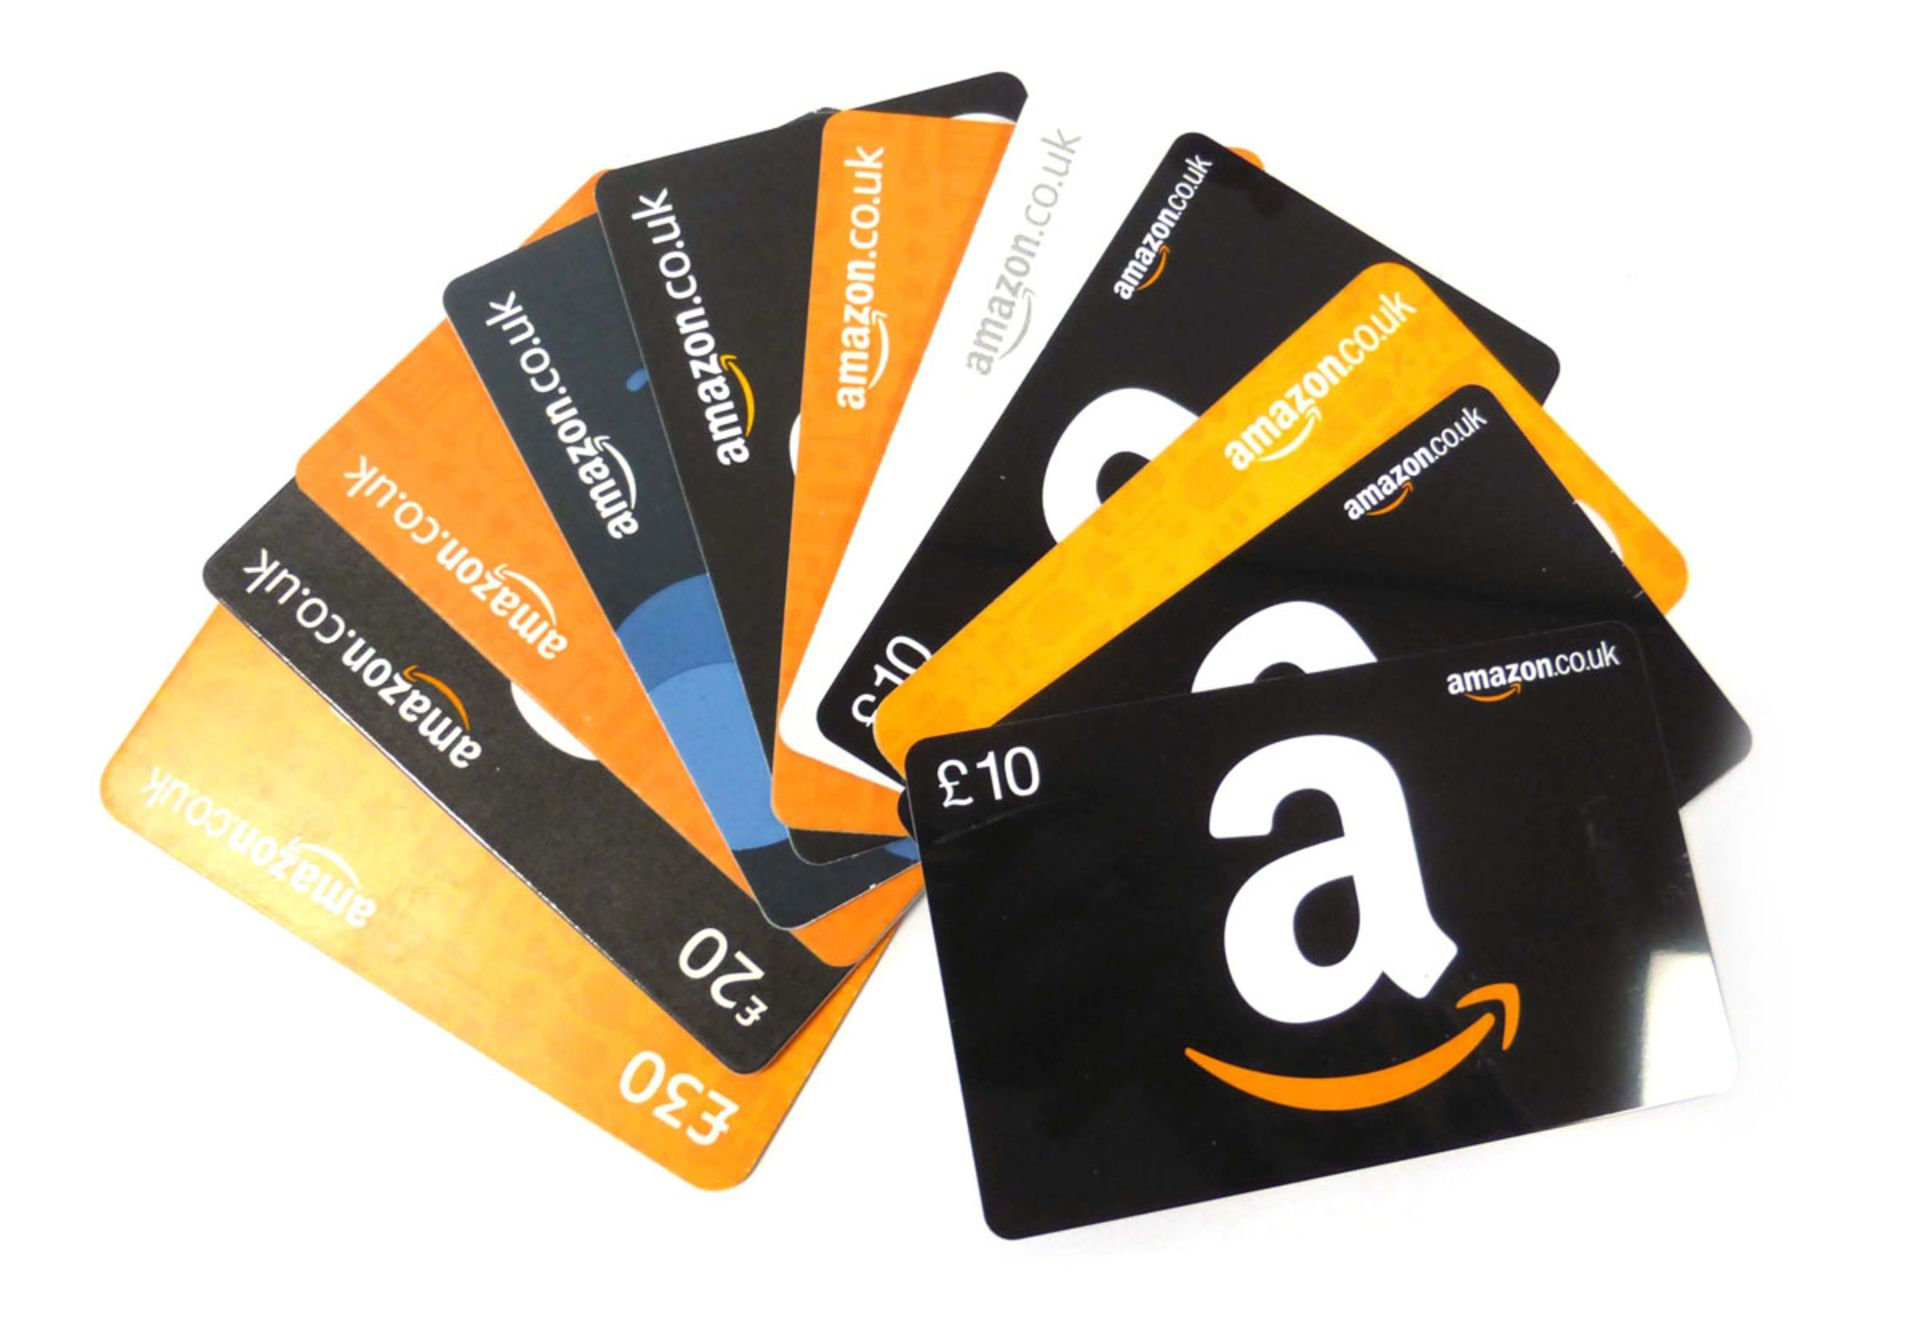 Amazon (x11) - Total face value £170